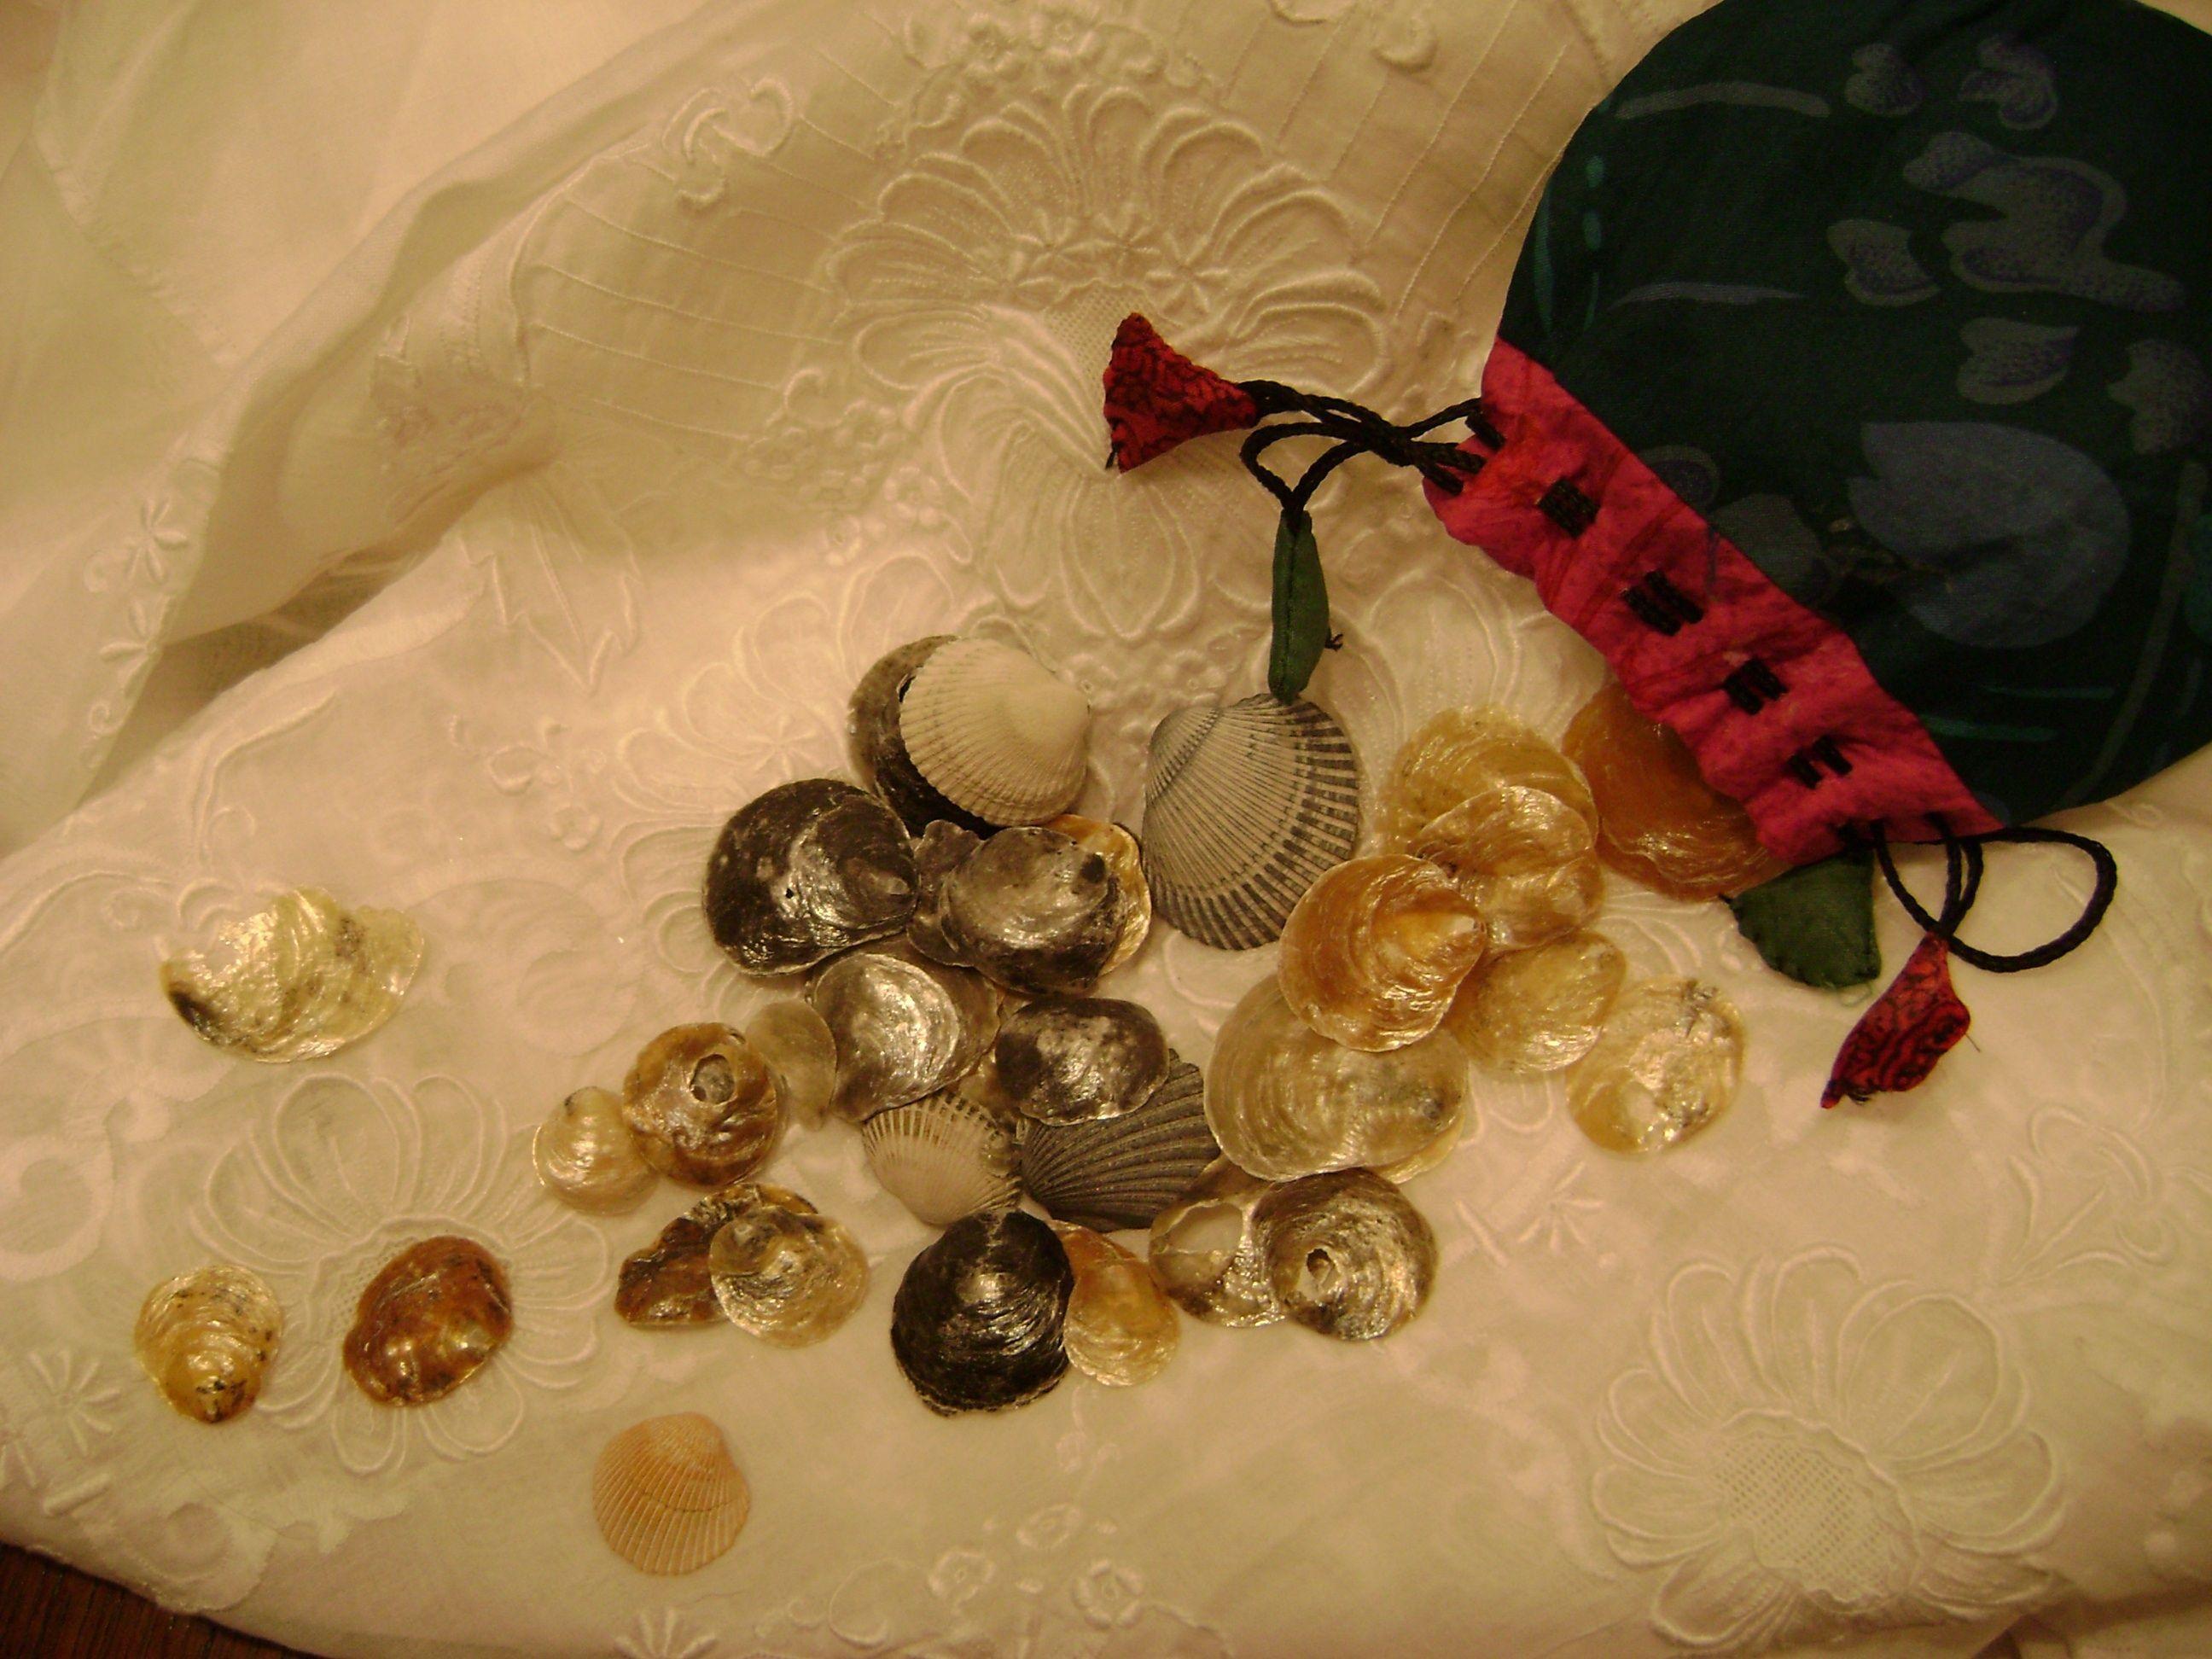 Drawstring purse spilling seashells onto  embroidered white linen.